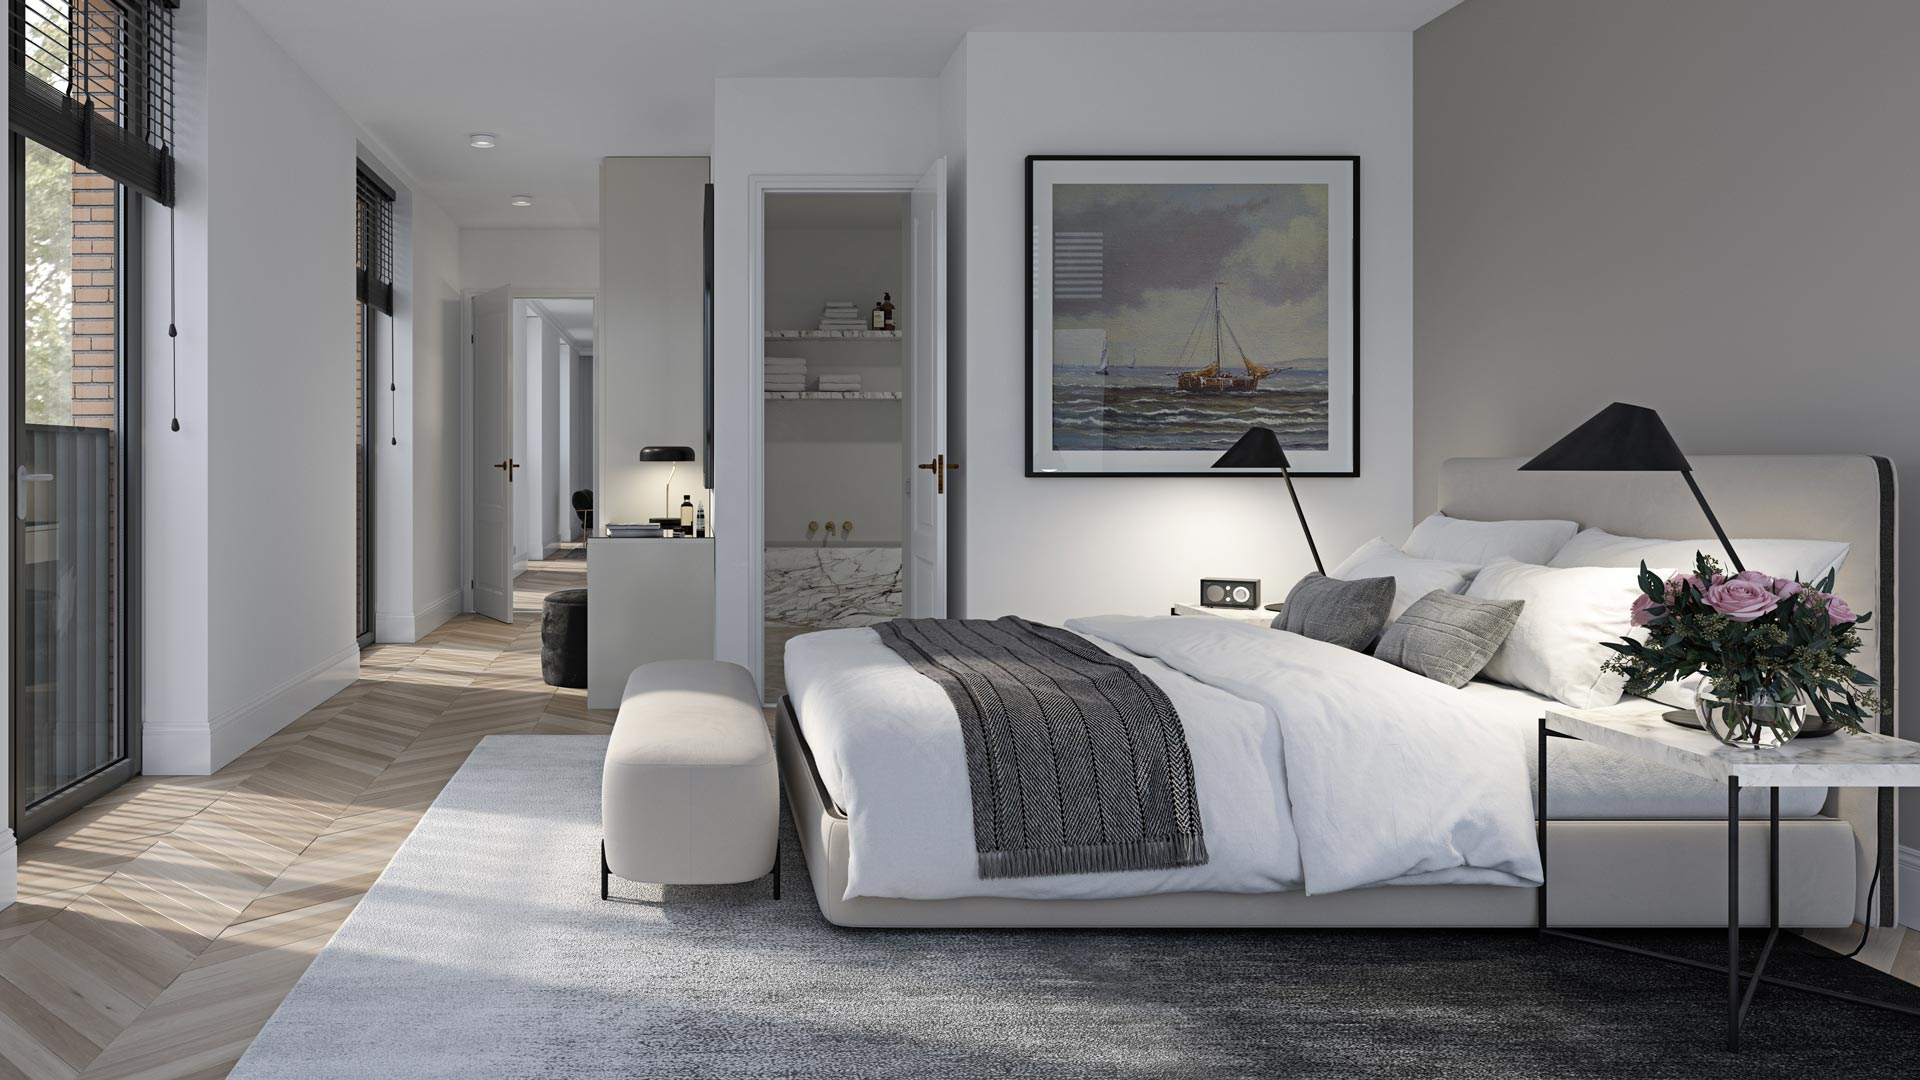 Type C - Interieur Slaapkamer - Appartementen - Elion Park